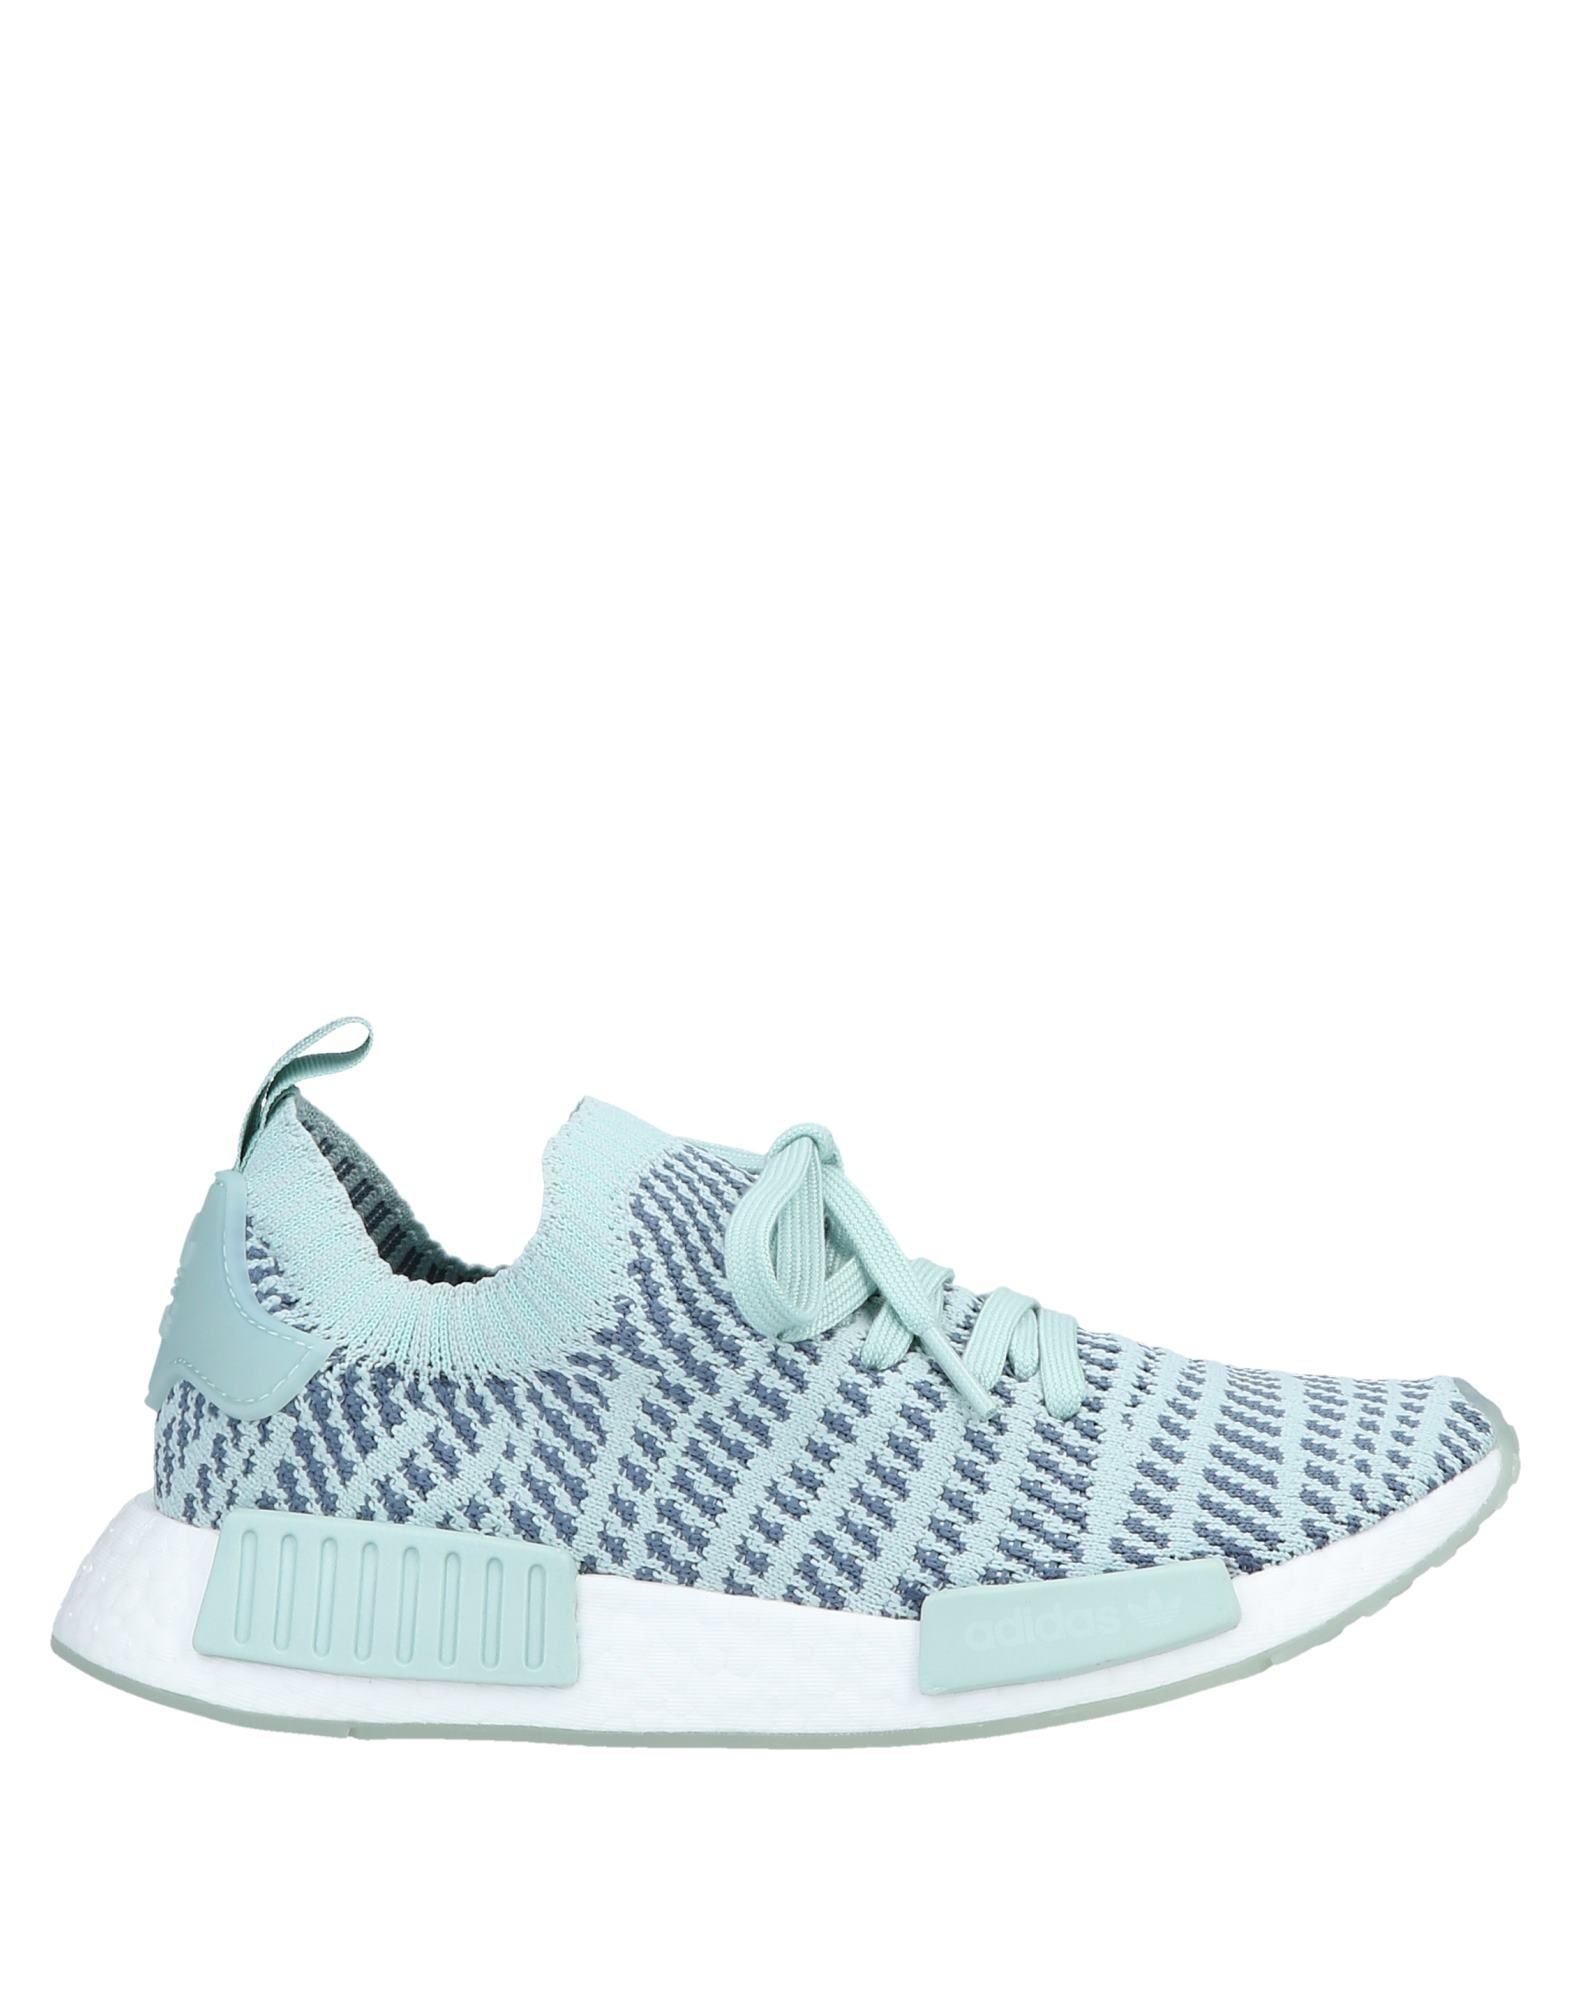 Turnschuhe Adidas Originals damen - 11569470AJ